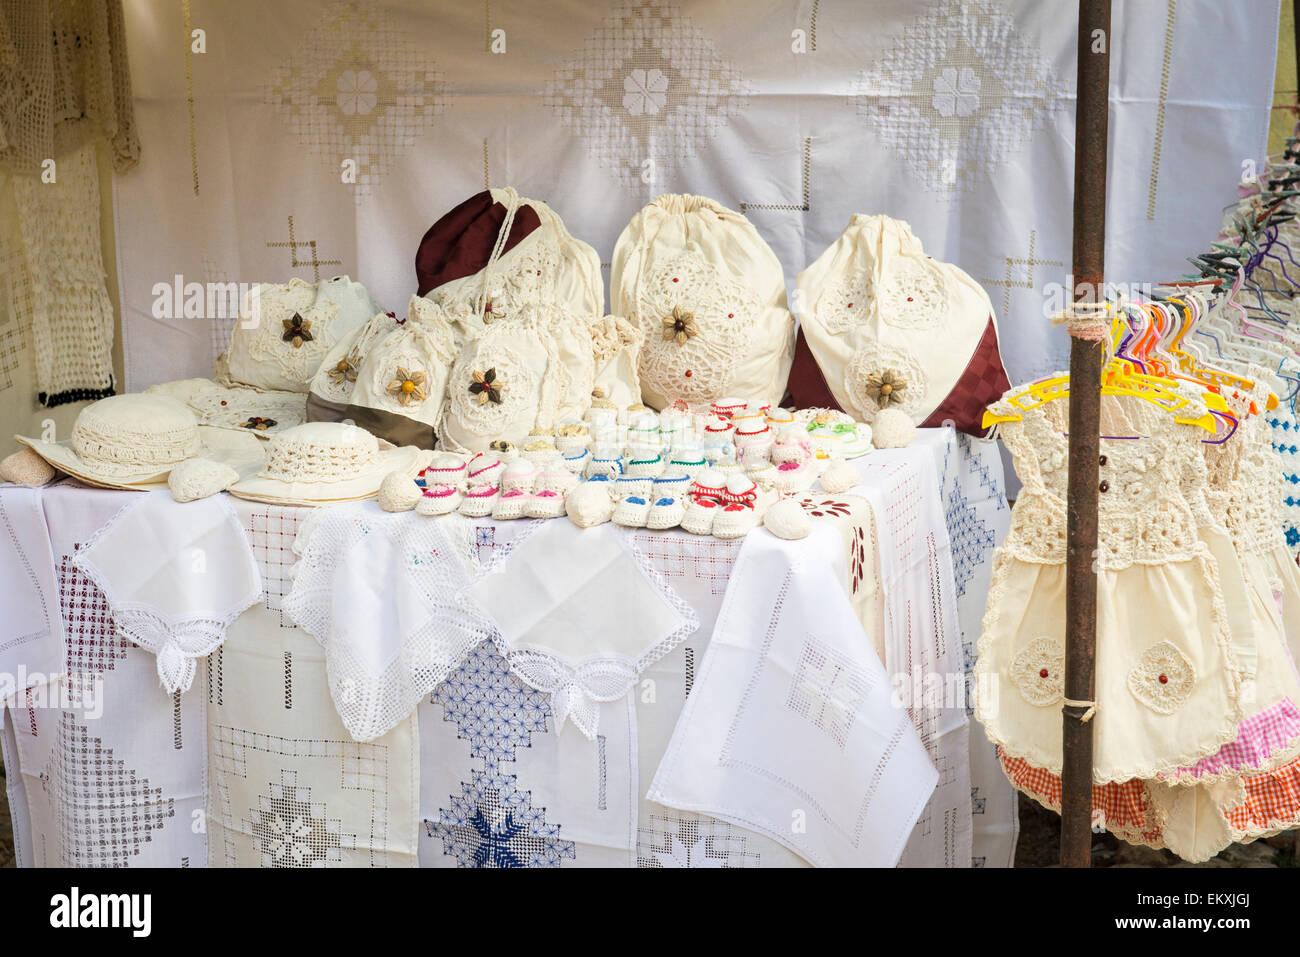 Cuba Trinidad Cobbled Street Arts Craft Handicrafts Market Stall Woven  Embroidered Crochet Hats Baby Dresses Booties Tablecloths